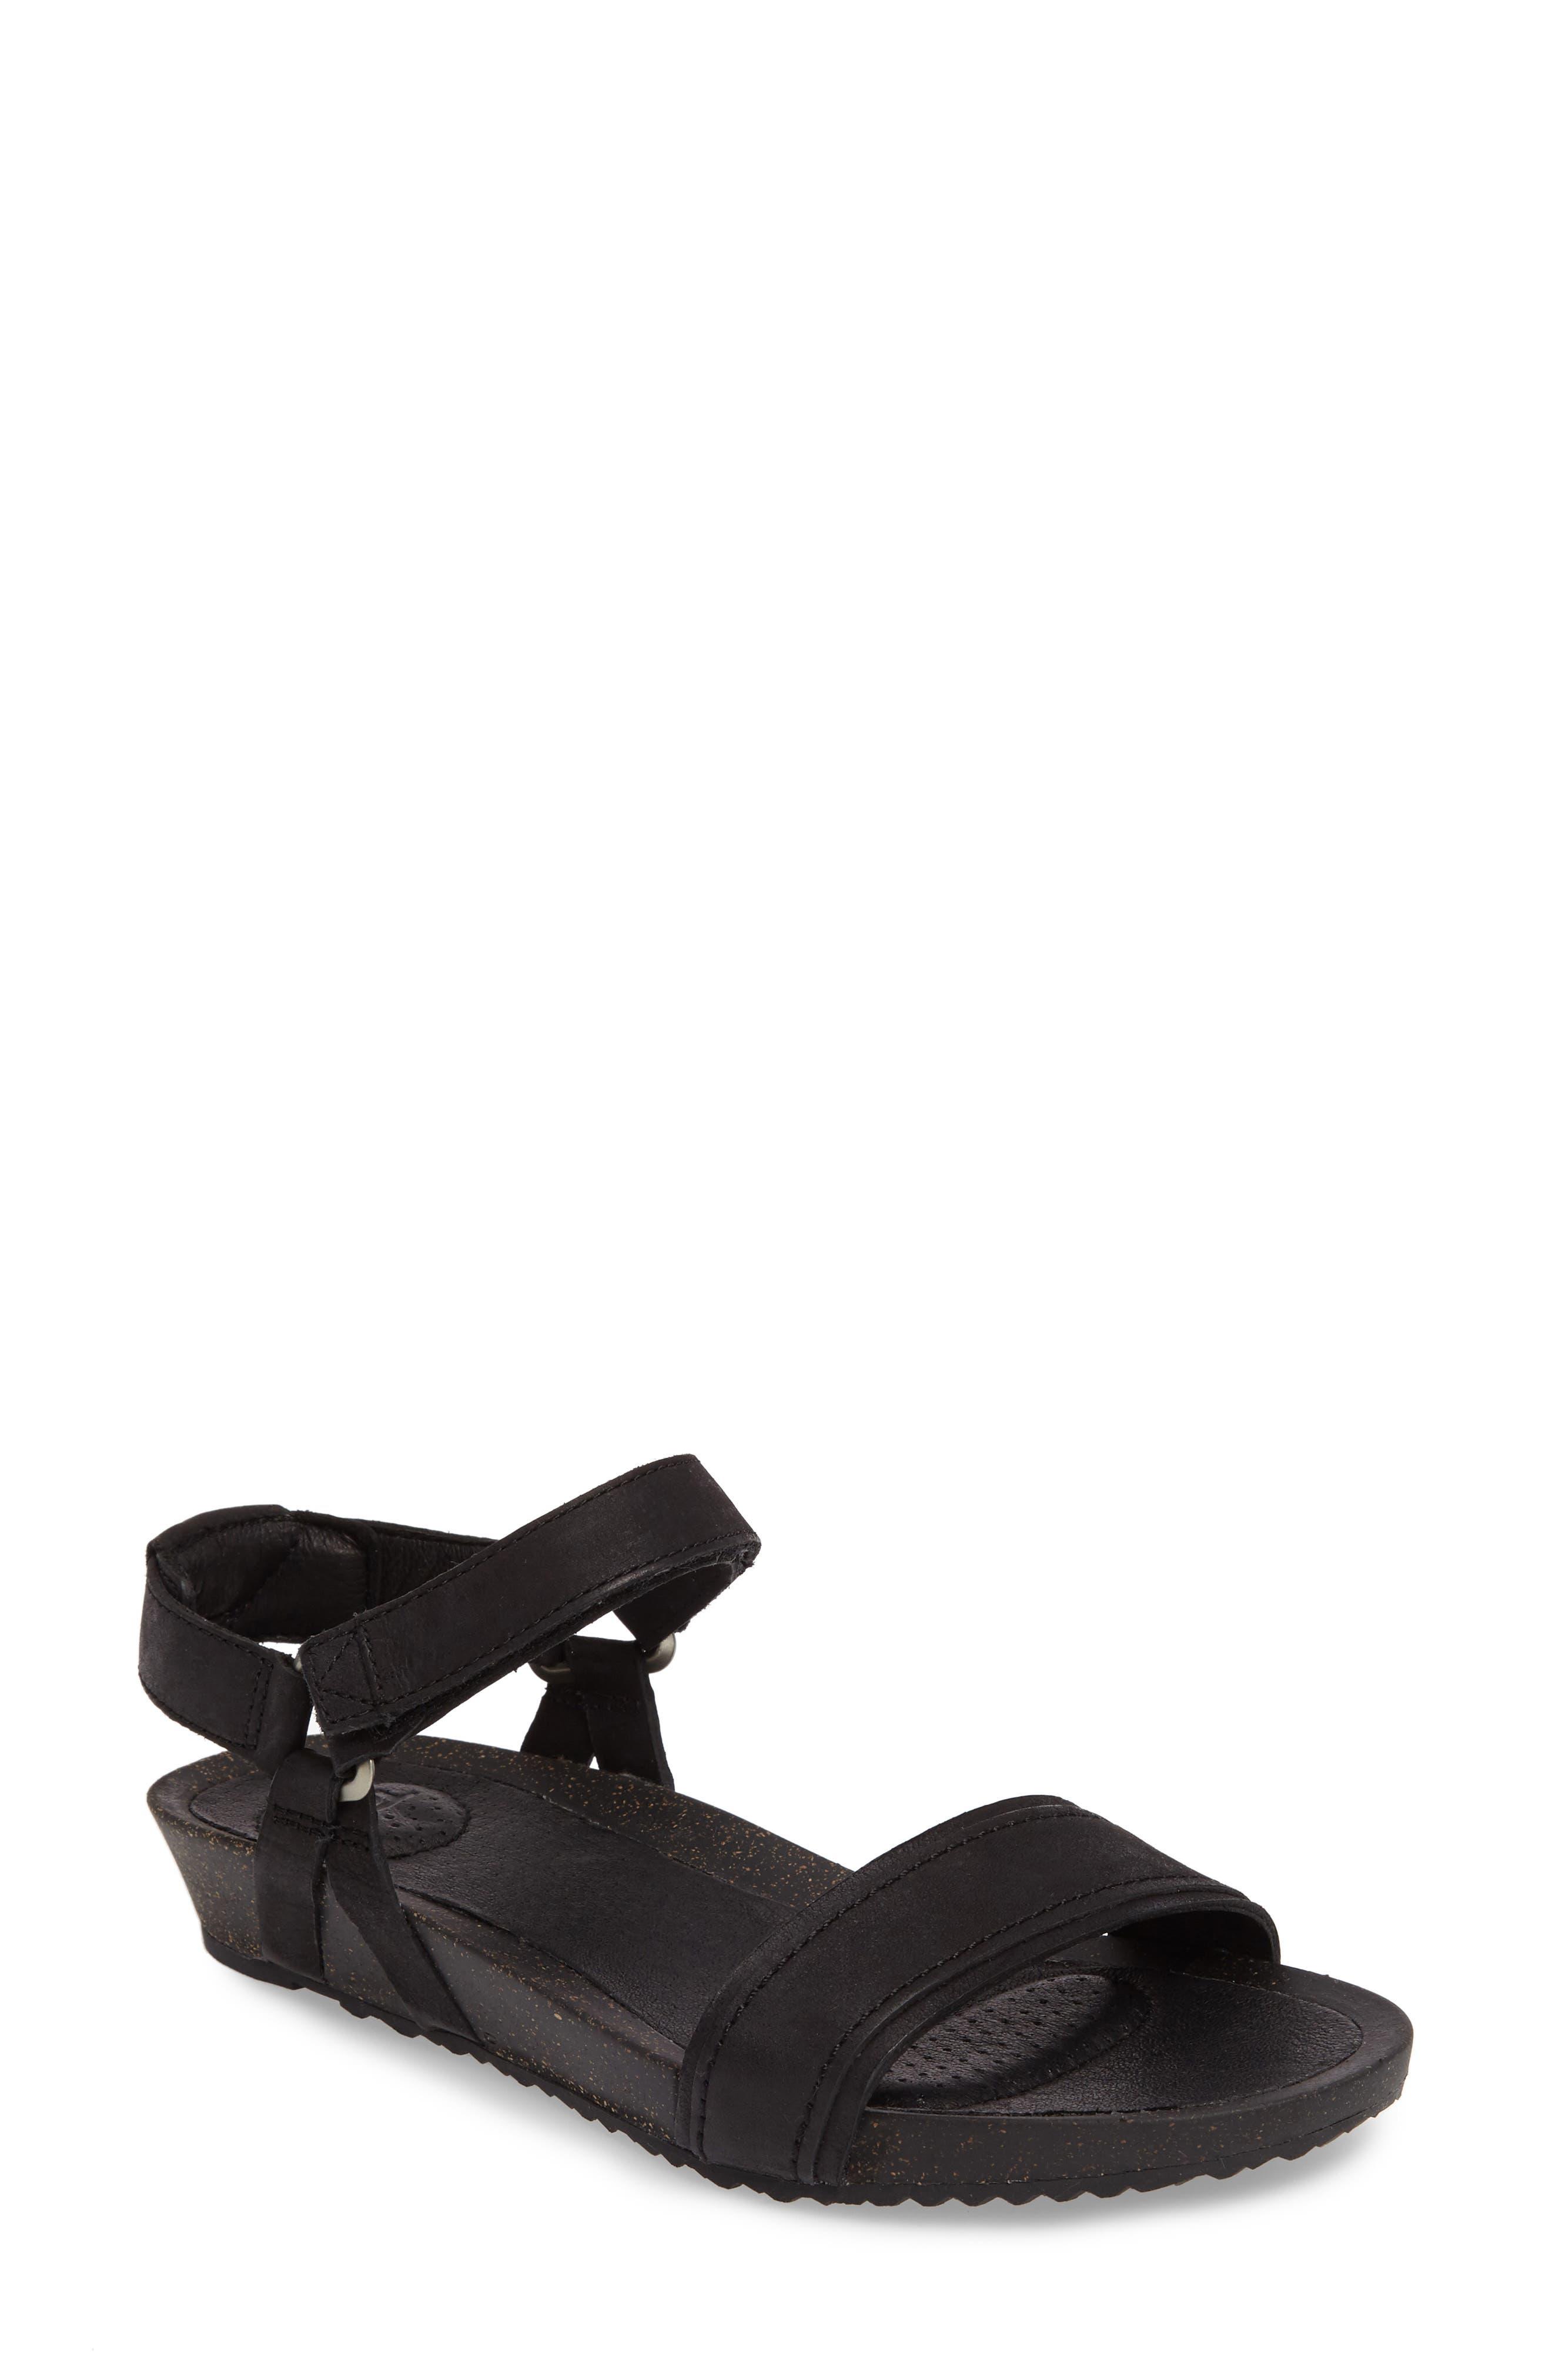 Alternate Image 1 Selected - Teva Ysidro Stitch Sandal (Women)